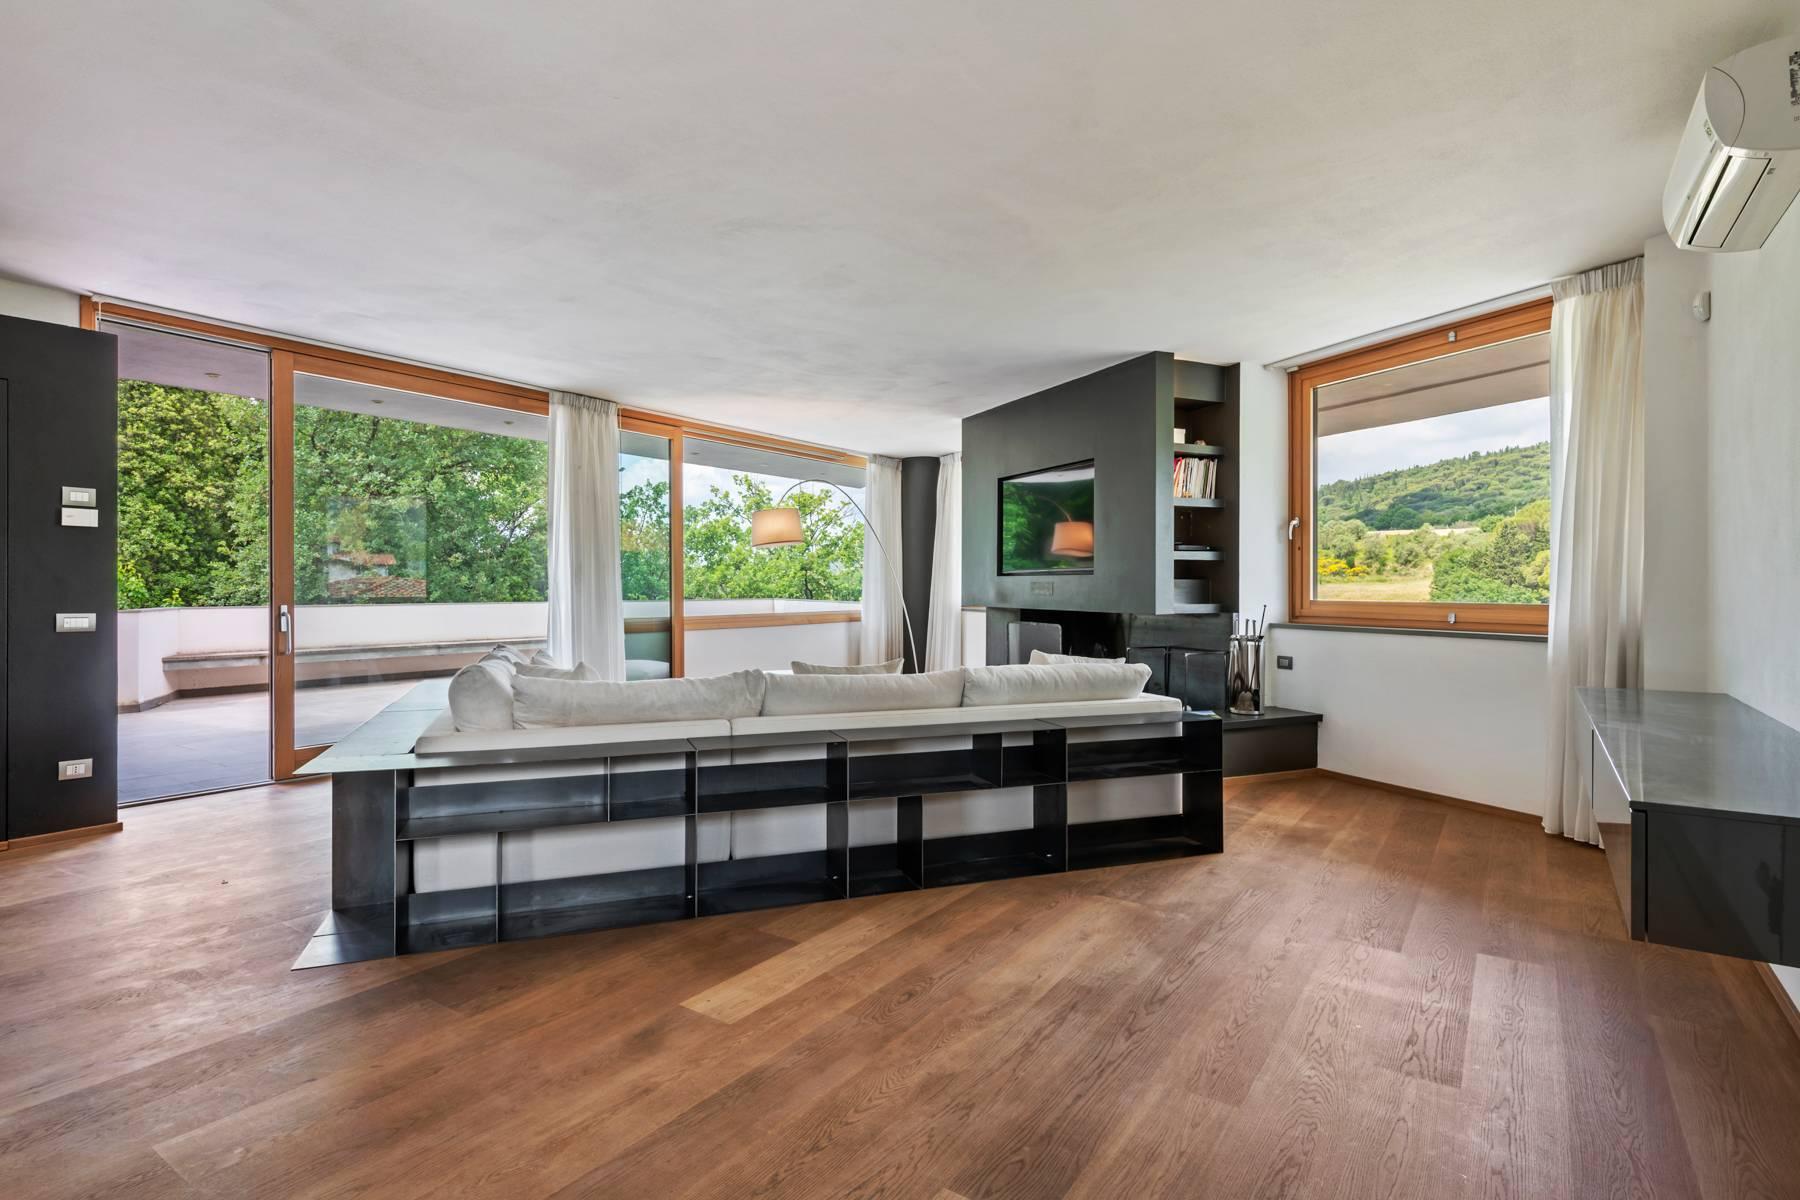 Appartamento in Vendita a Pontassieve: 5 locali, 300 mq - Foto 4